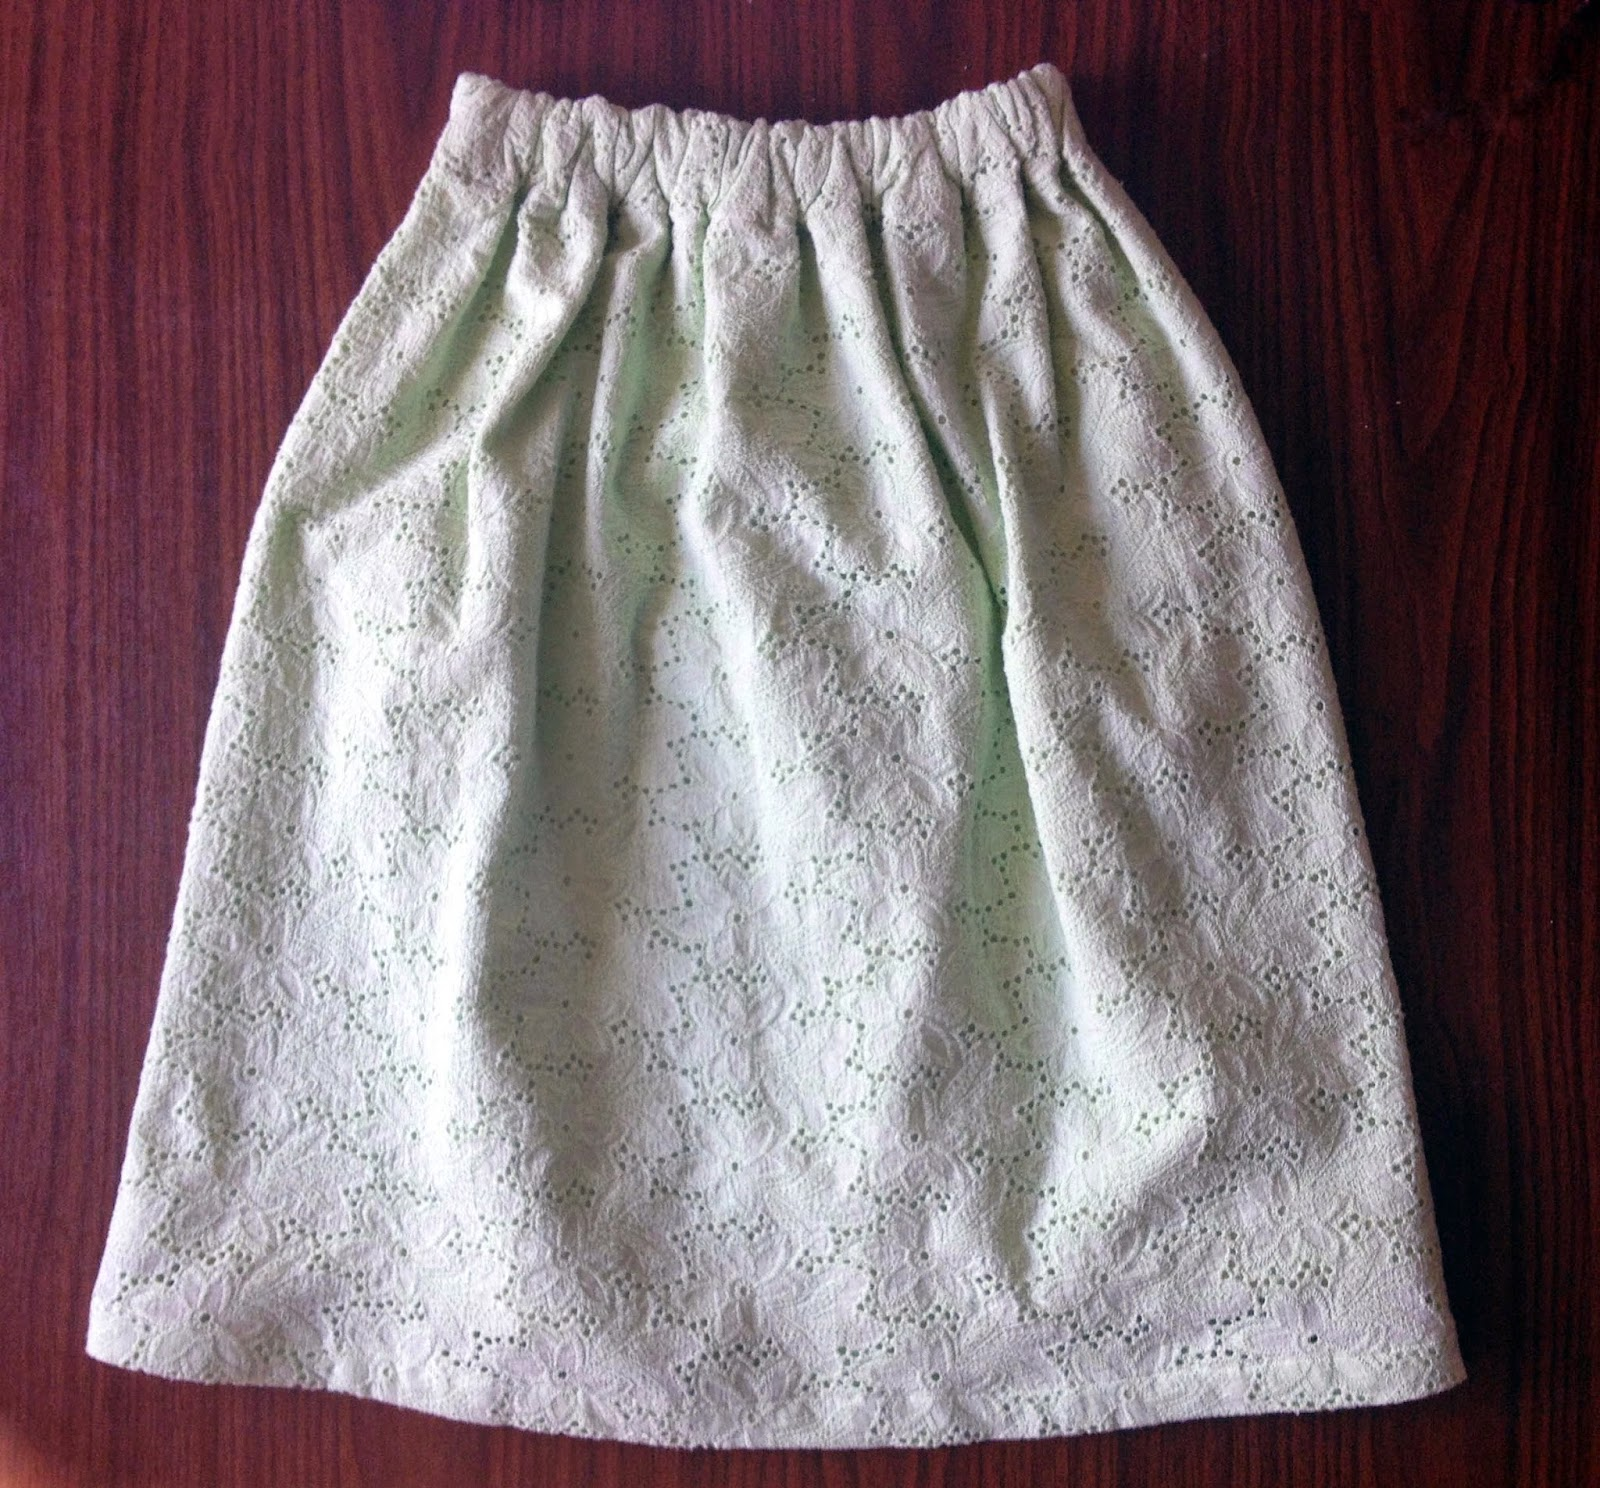 Пошив юбки на резинке широкой